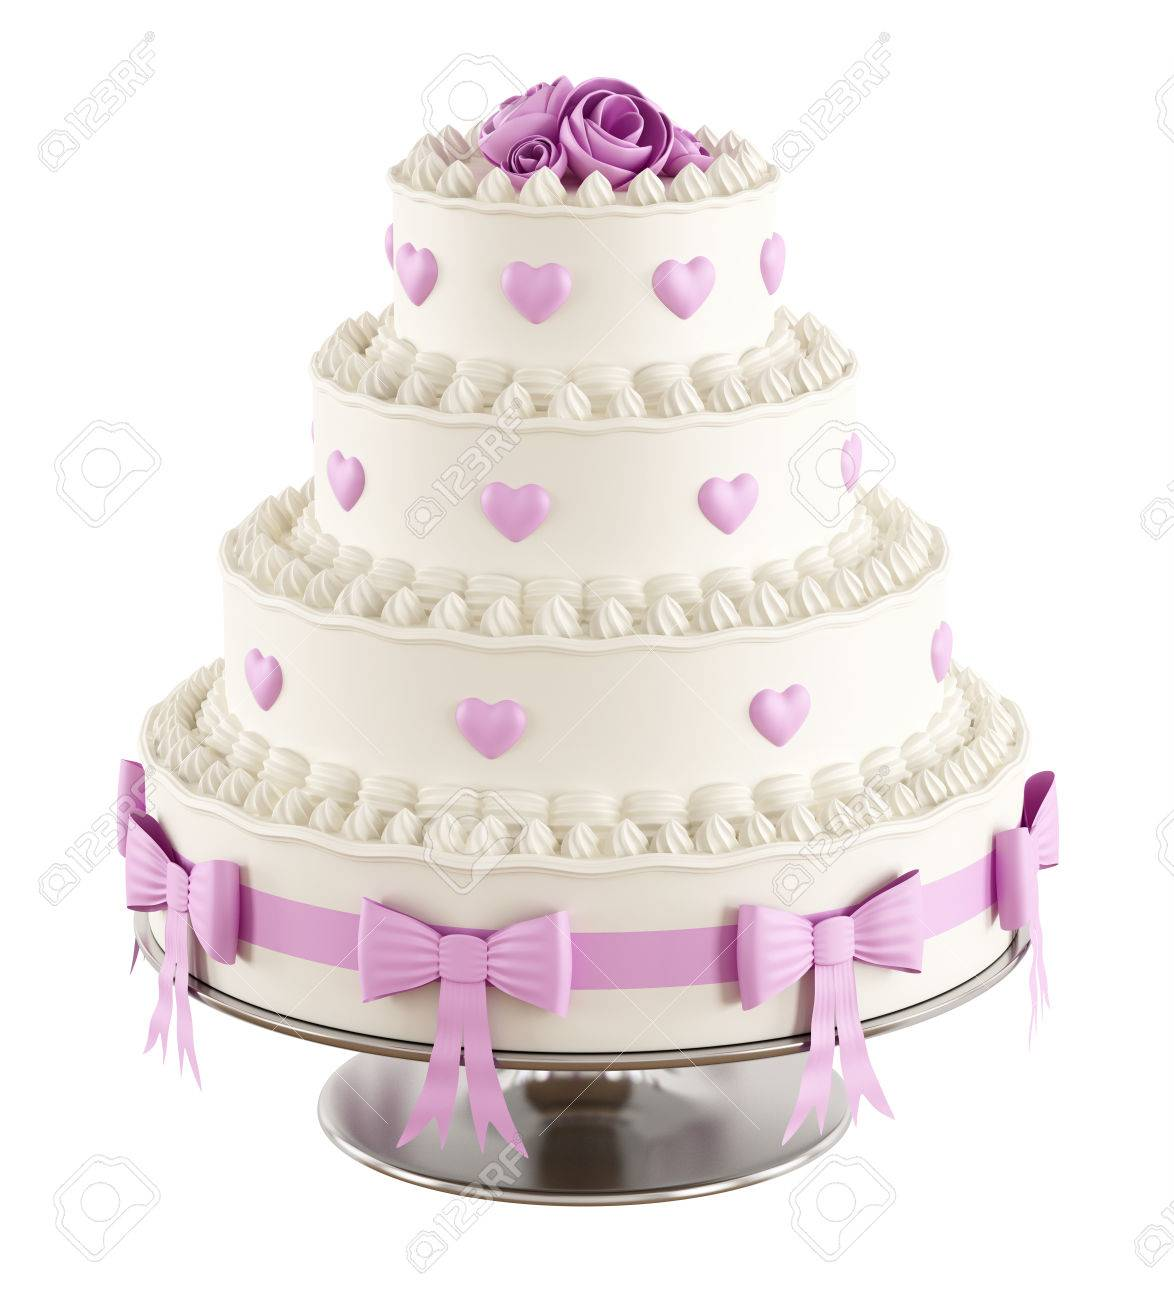 Enchanting 3d Wedding Cake Vignette - The Wedding Ideas ...